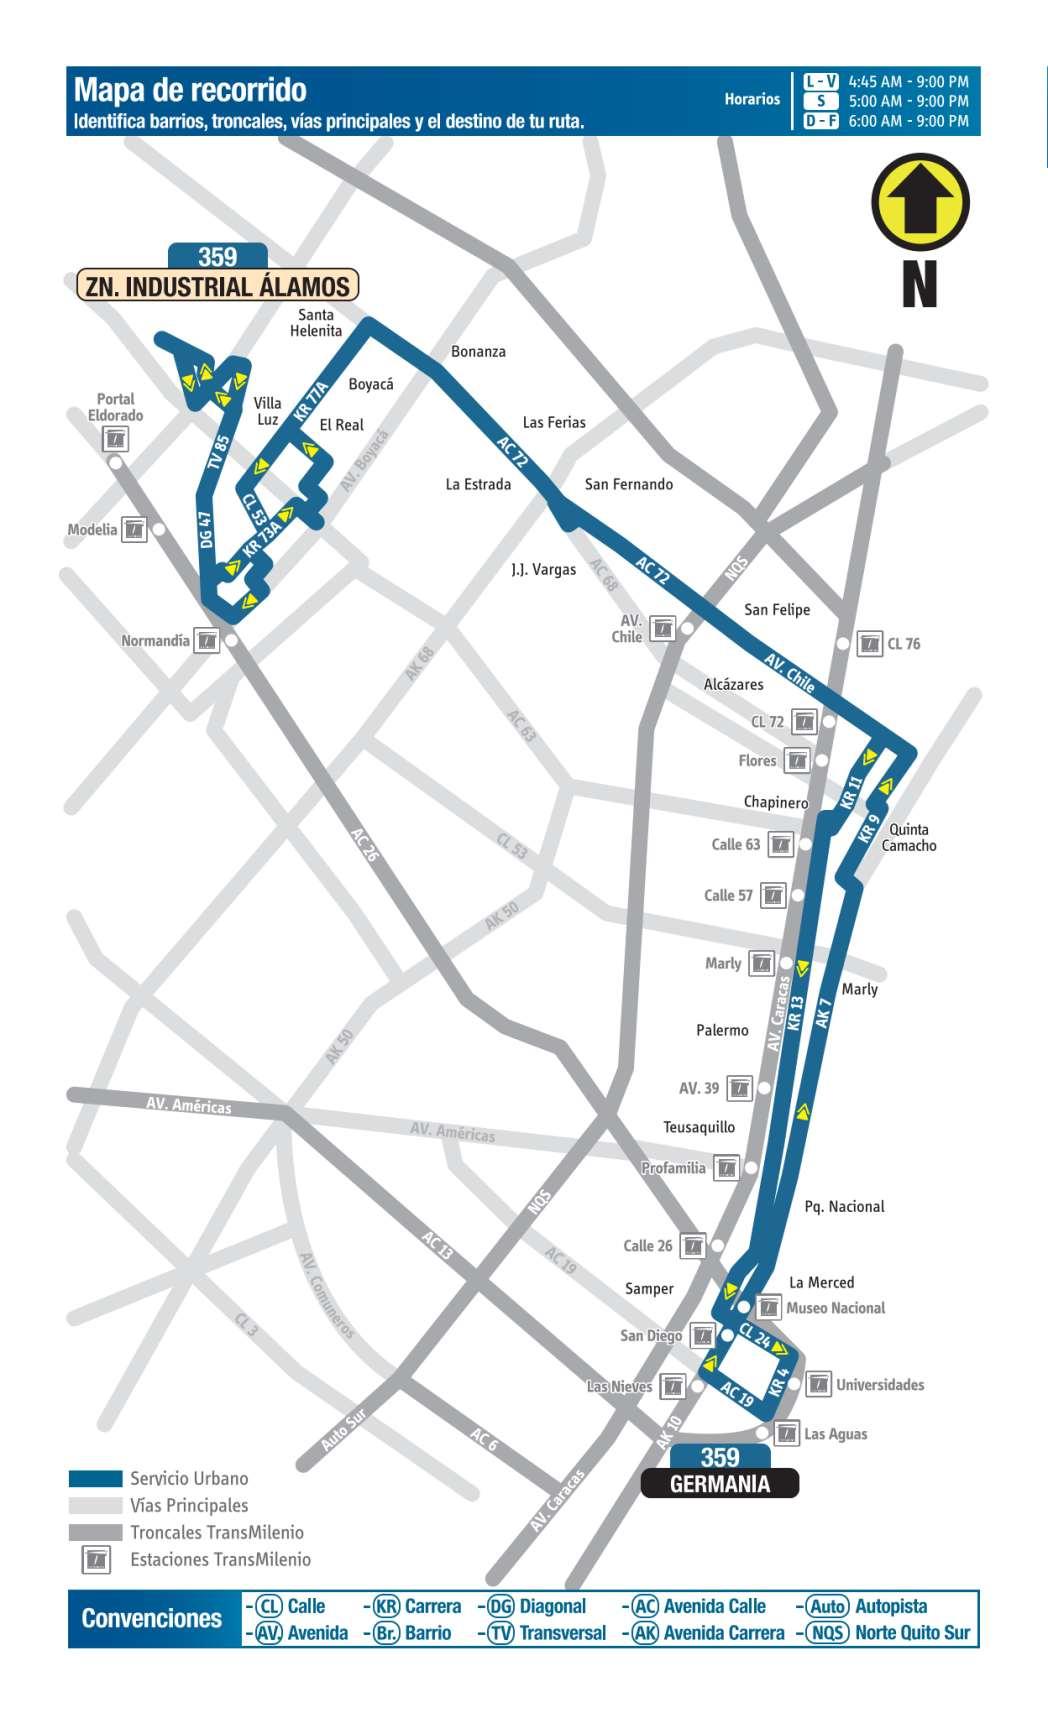 359 Germania - Zona Industrial Álamos, mapa bus urbano Bogotá